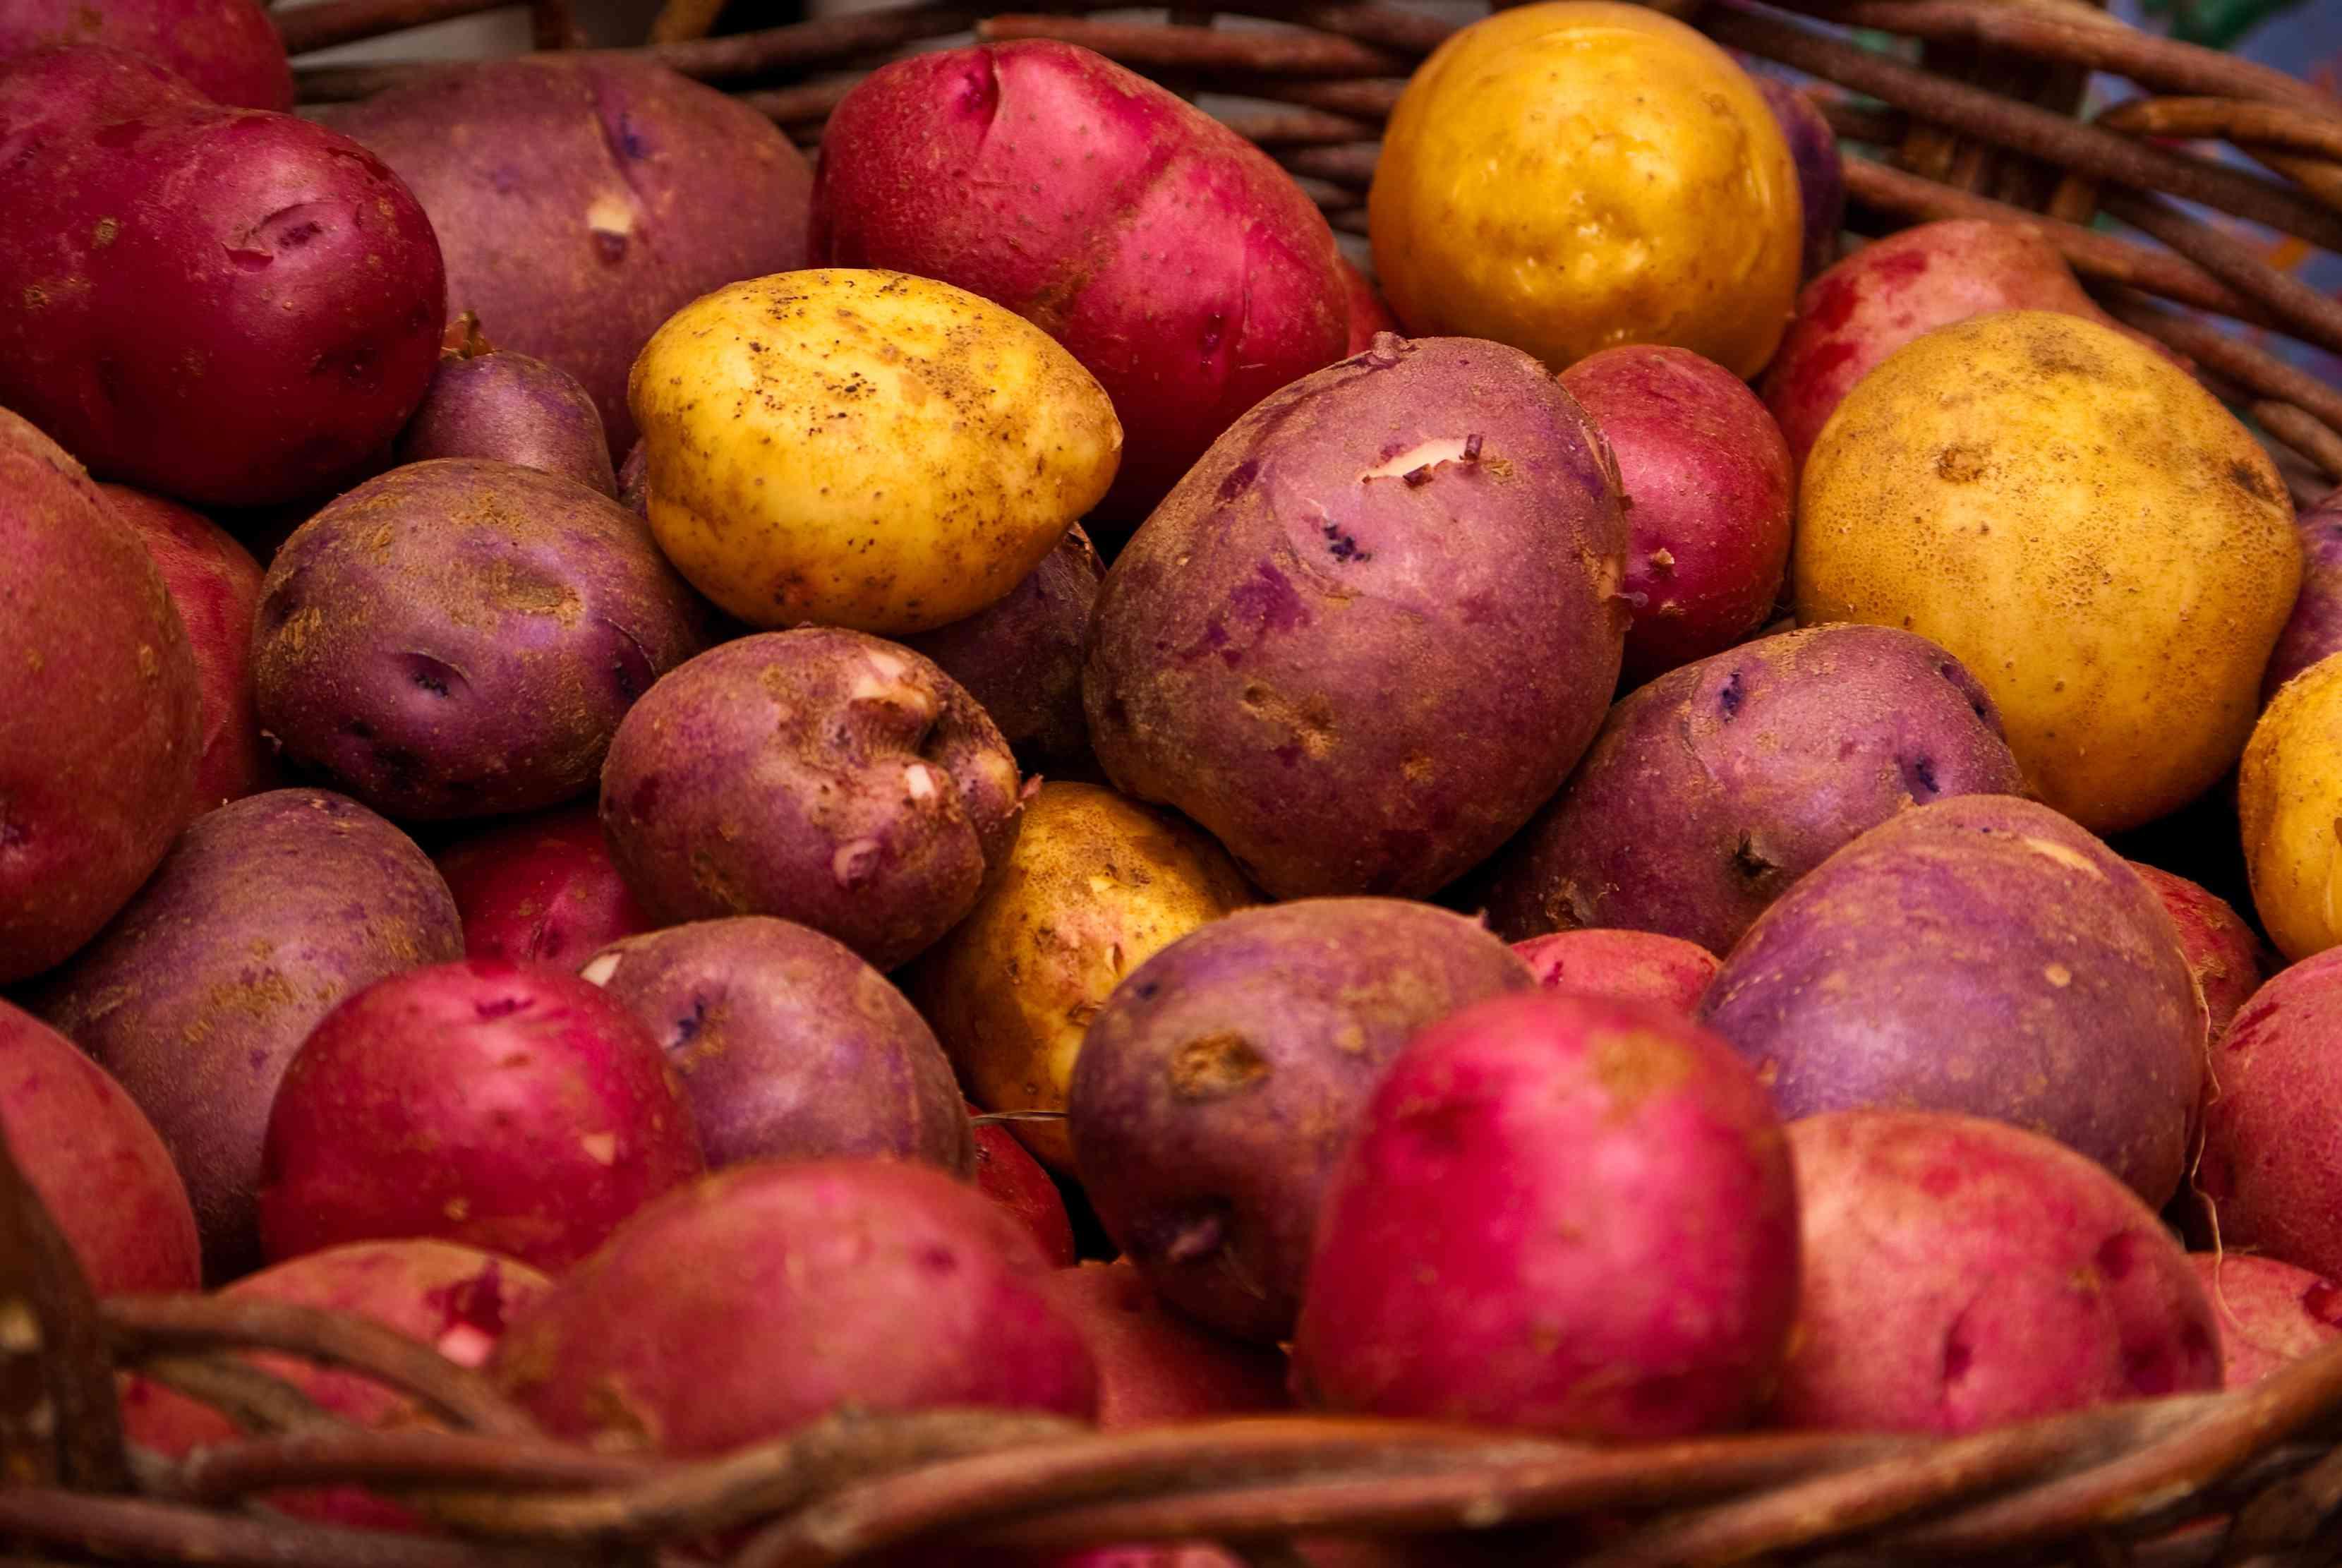 Maine Potatoes at Portland Farmers Market